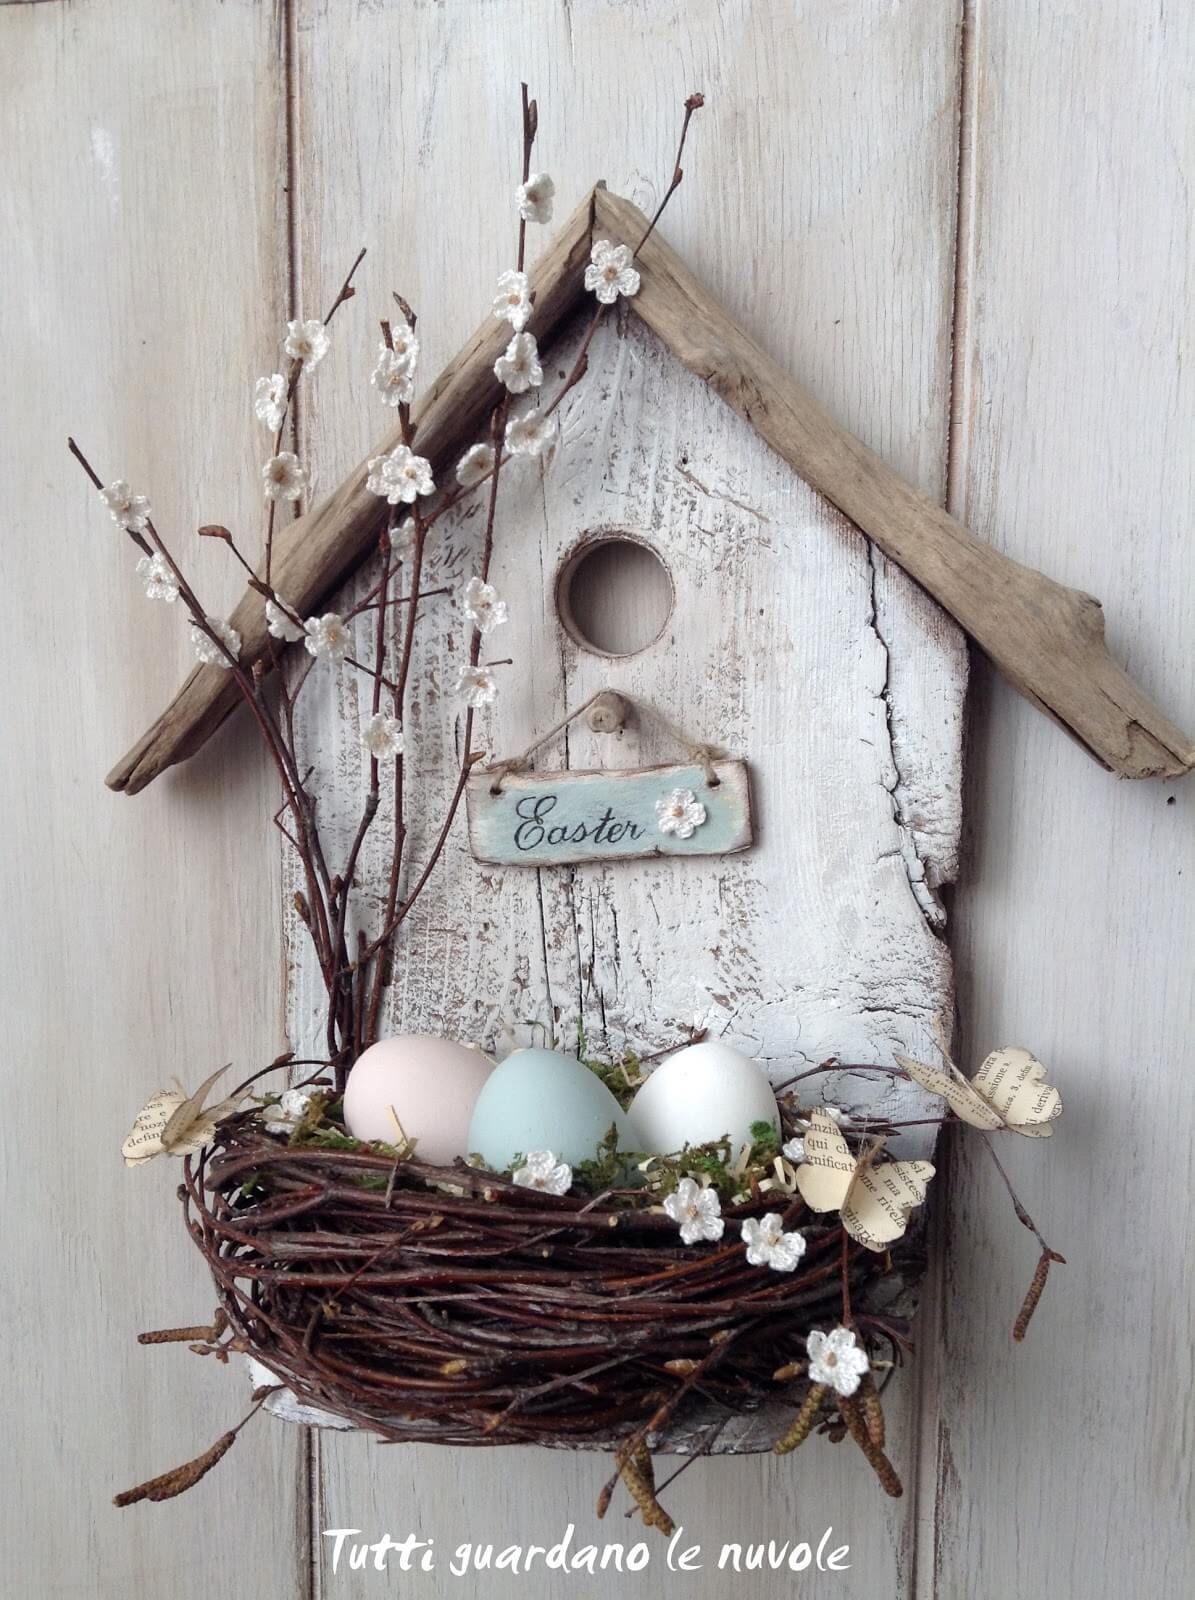 28 Gorgeous Spring Decor Ideas to Brighten Your Life | Storm doors ...